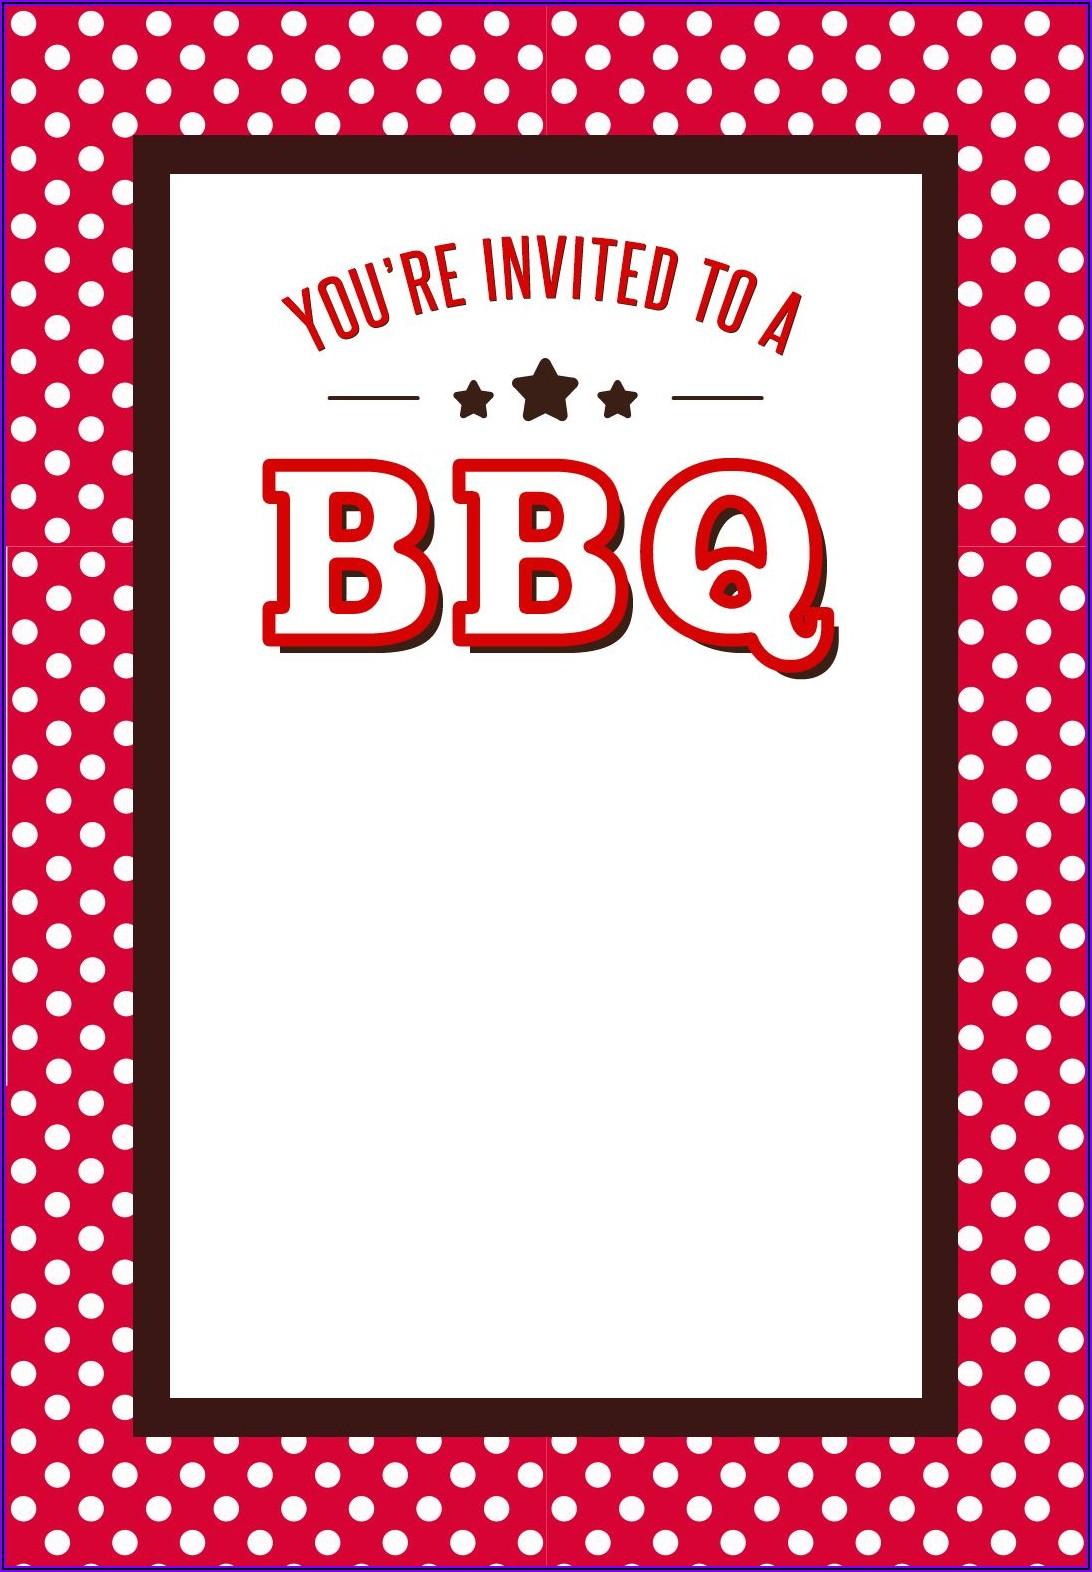 Farewell Bbq Invitation Wording